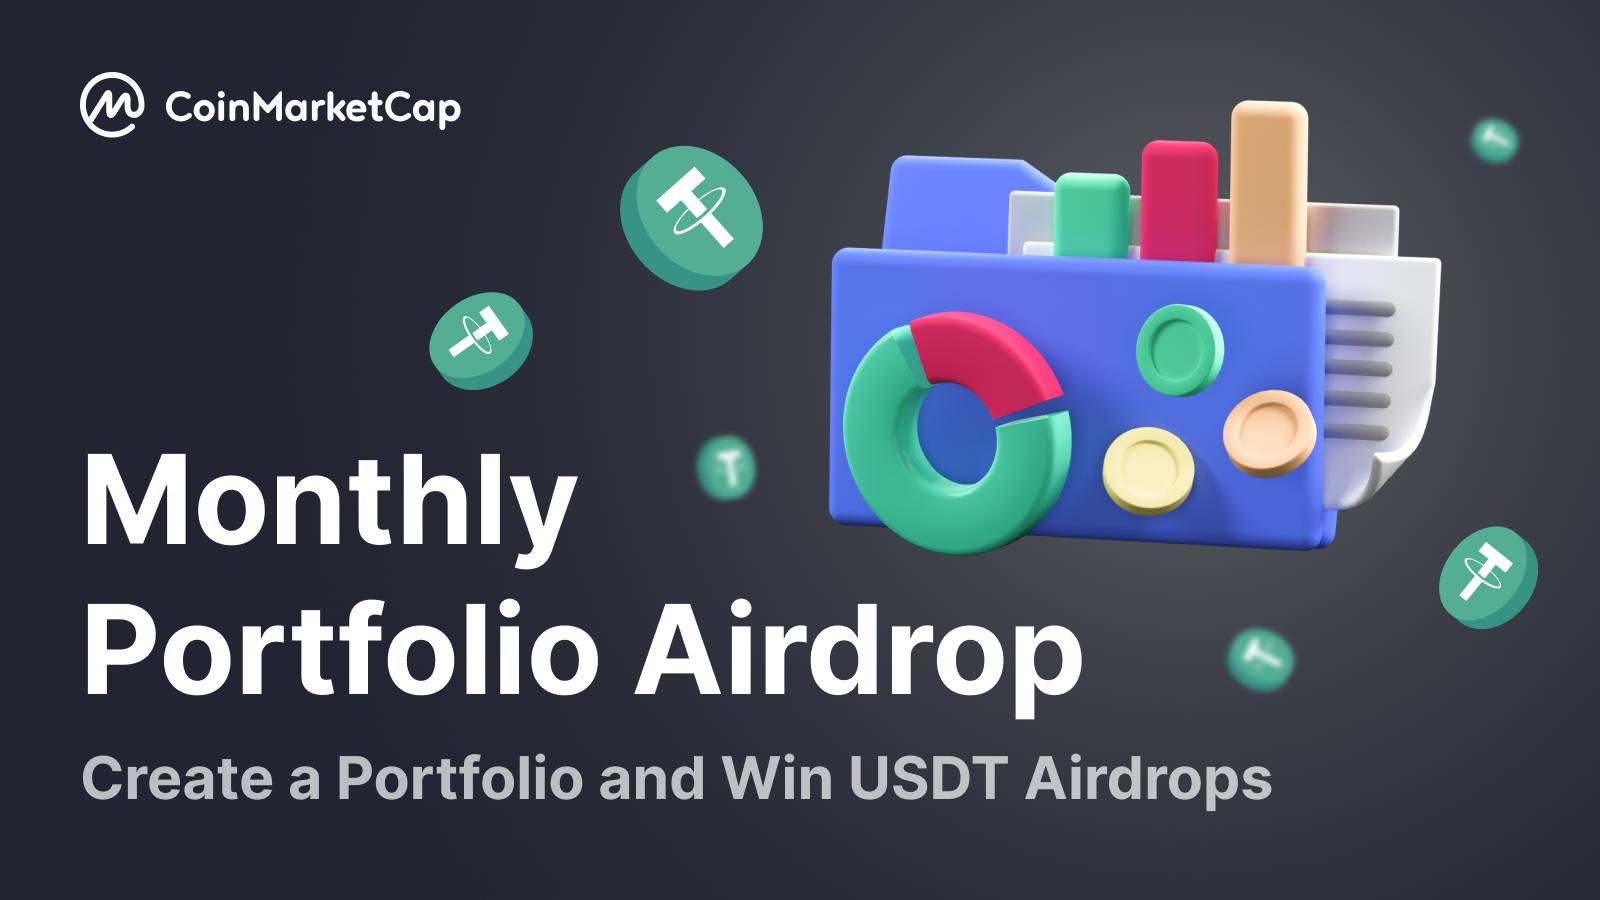 CoinMarketCap 'Monthly Portfolio Airdrop' Event